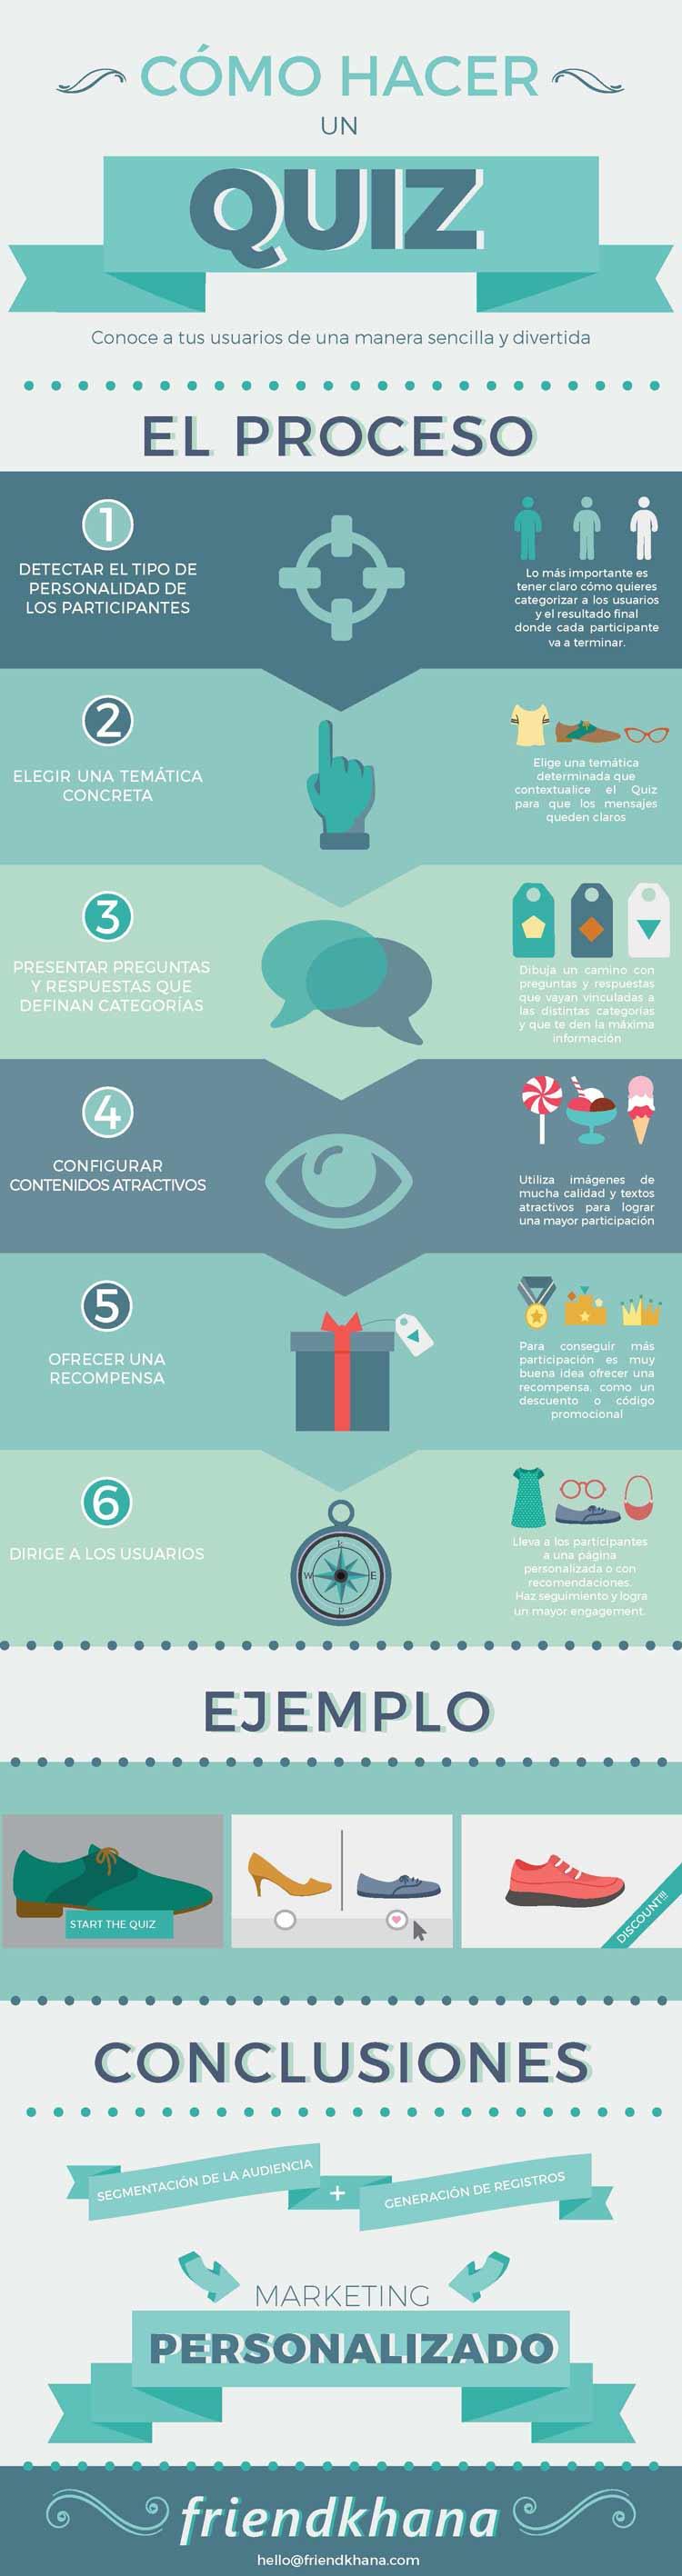 infografiamarketingpersonalizado